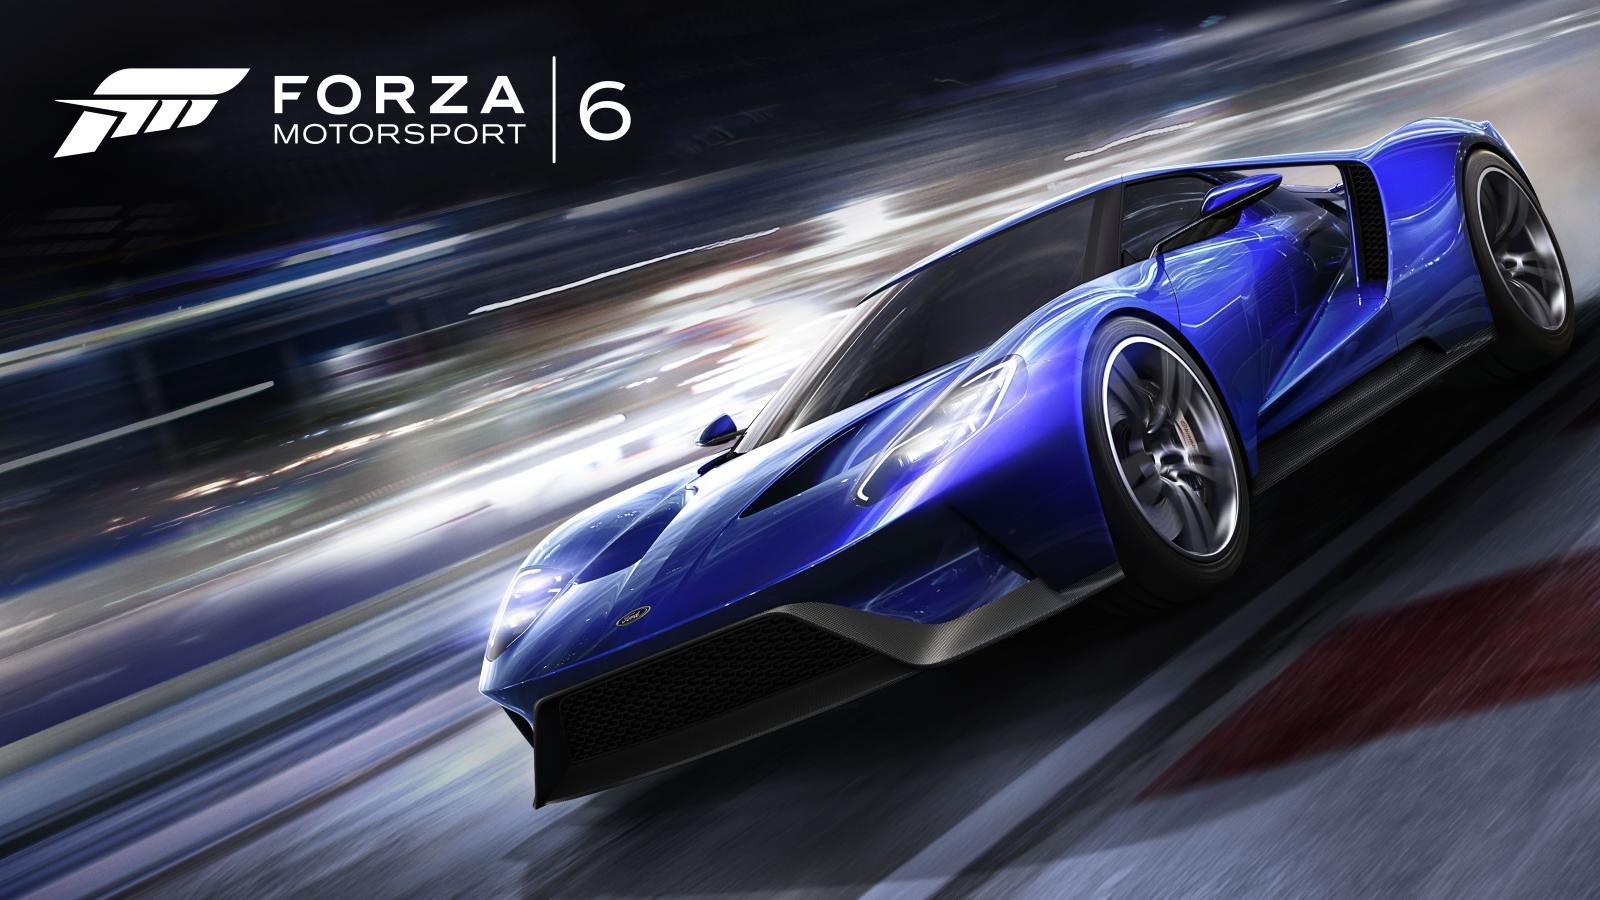 Forza Motorsport 6 Wallpapers Hd For Desktop Backgrounds